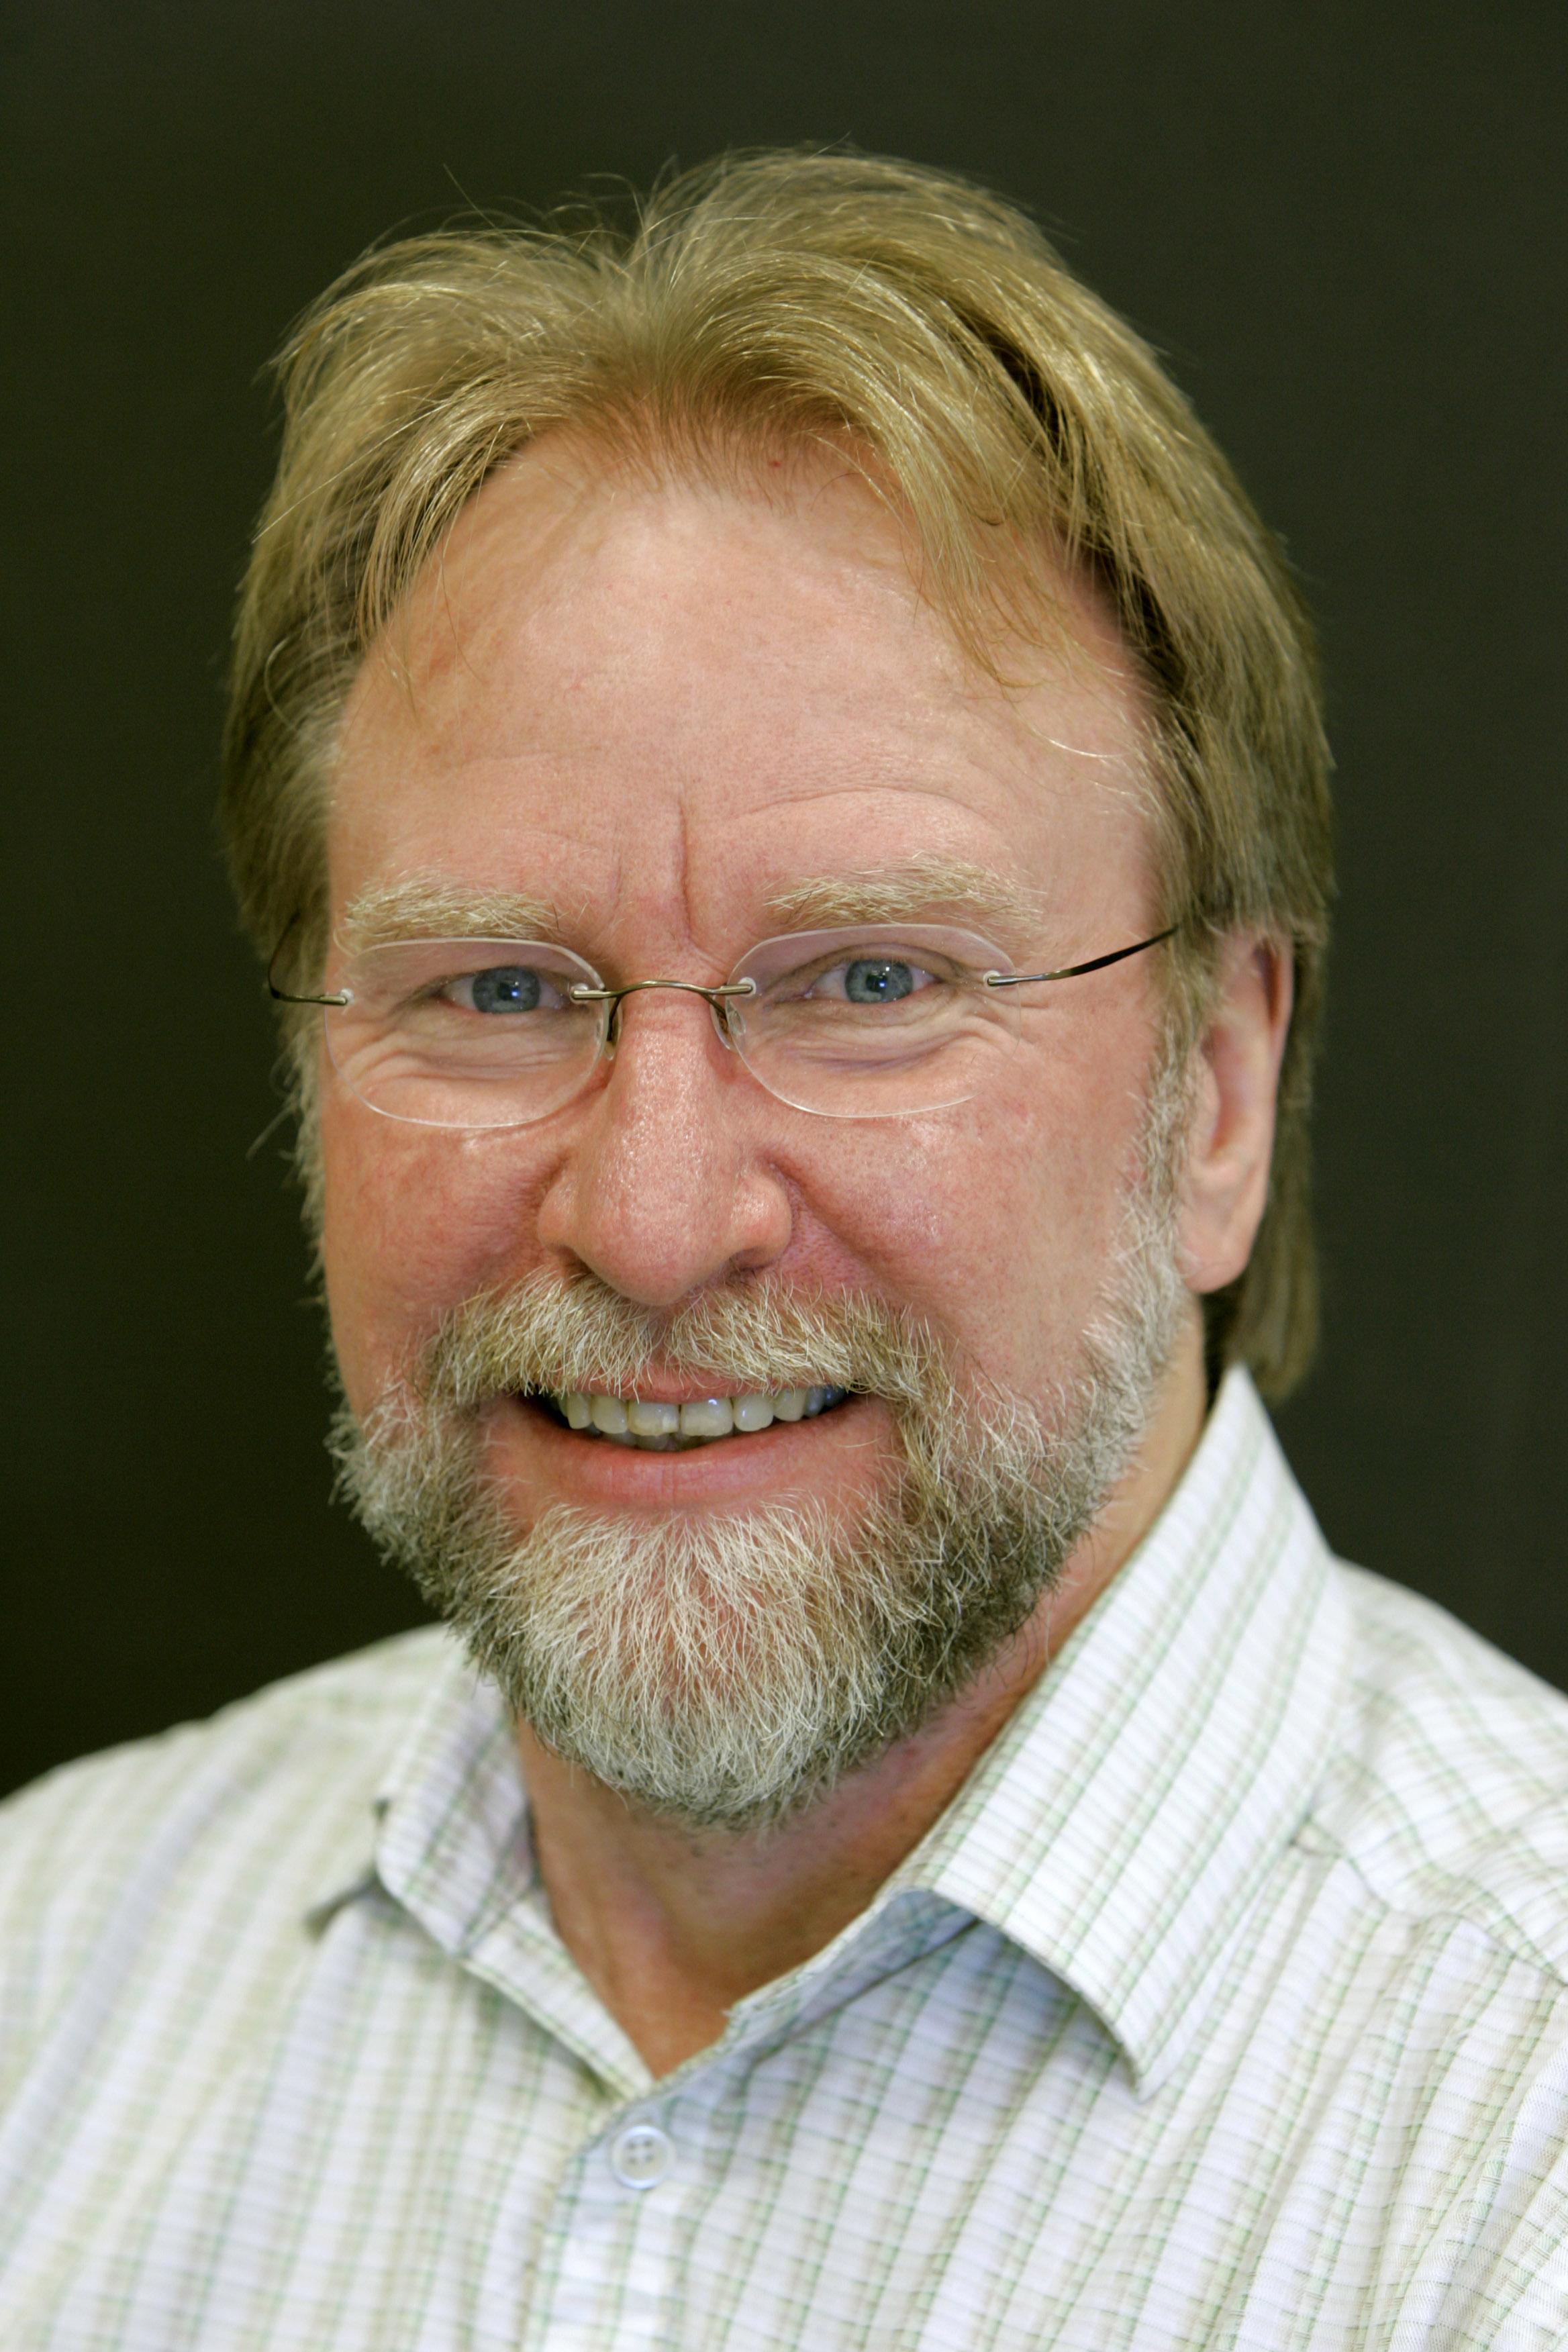 Paul Pearson, Managing Director, Wieck Australasia